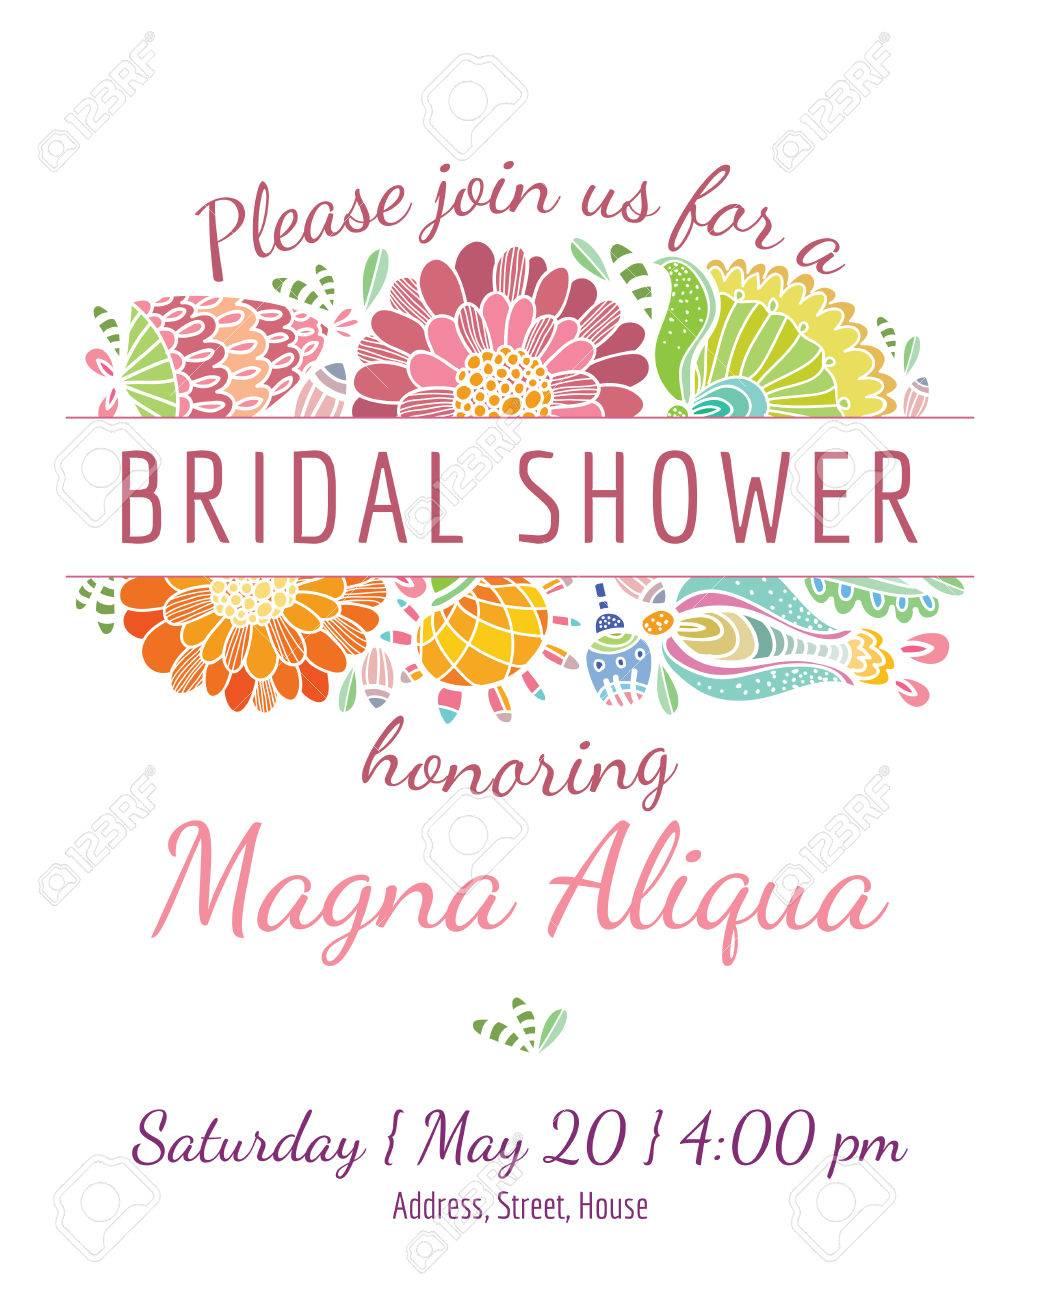 Invitation Bridal Shower Card Vector Template For Invitations - Bridal shower flyer template